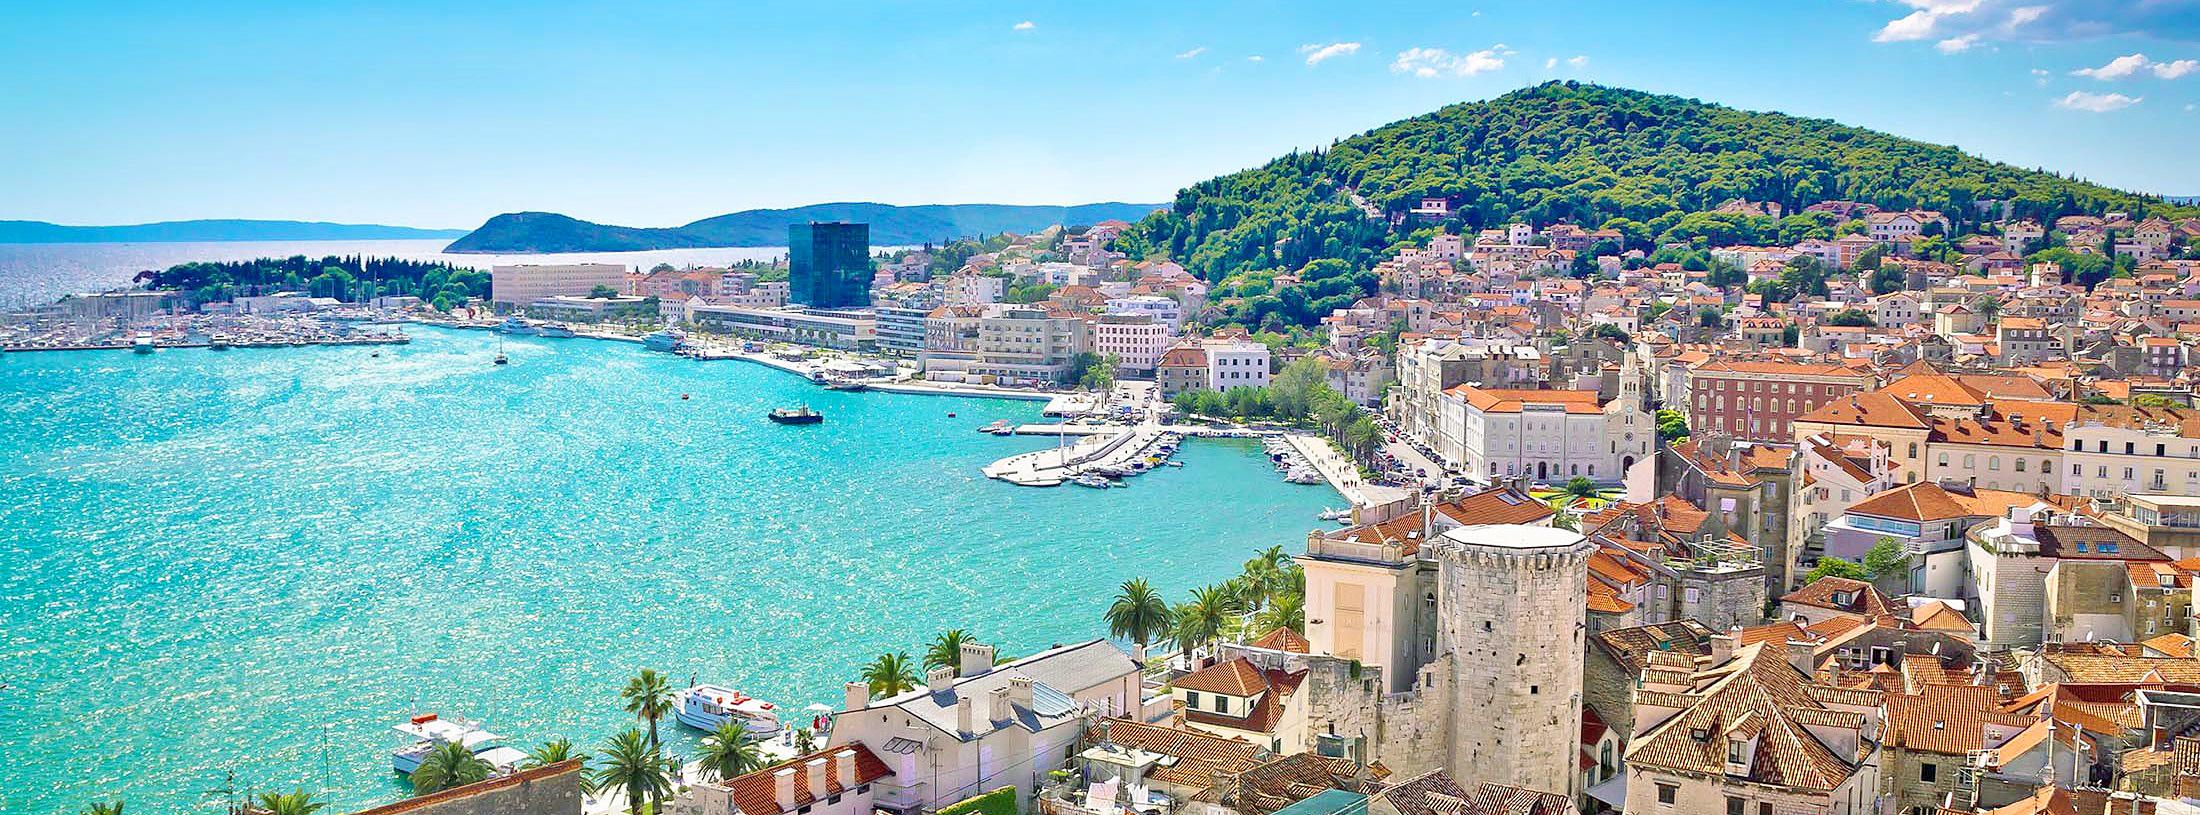 KroatiaSplit, Pula, Brac, Rovinj, Makarskan Riviera jne.